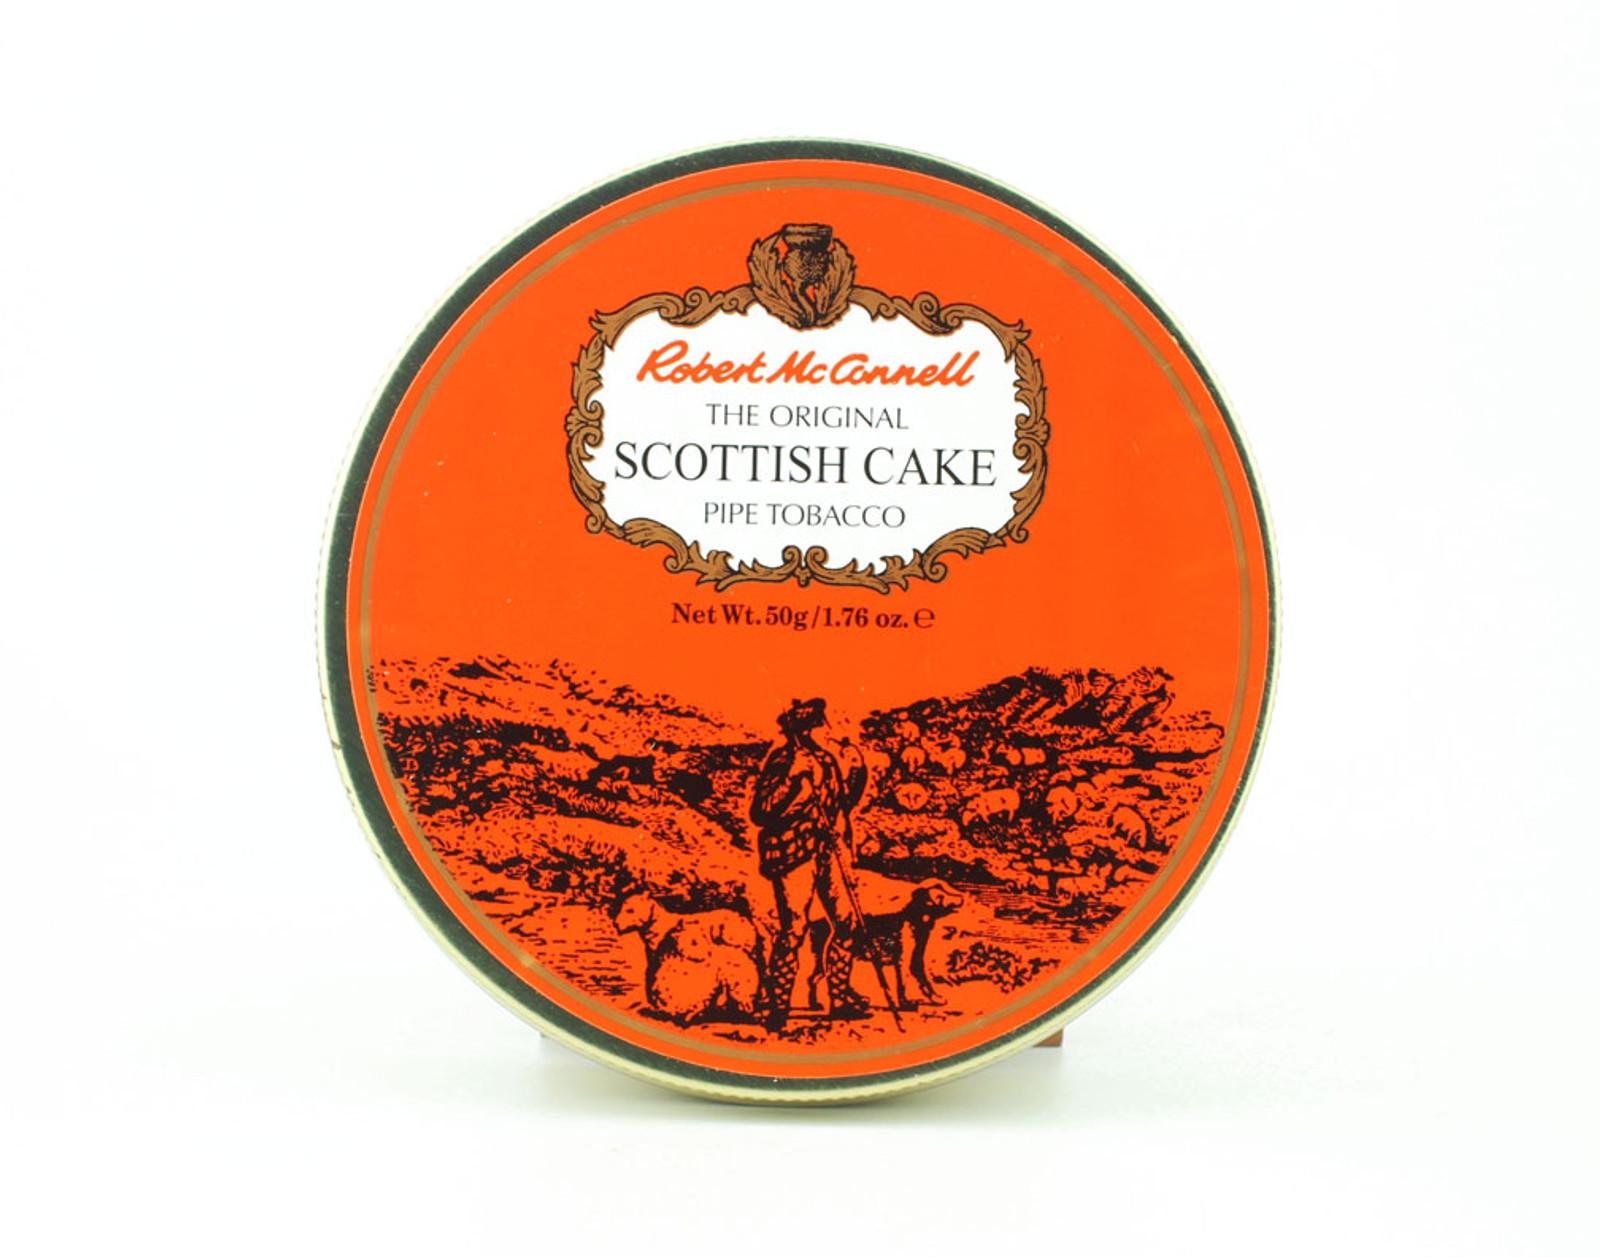 Robert McConnell Scottish Cake (50g tin)